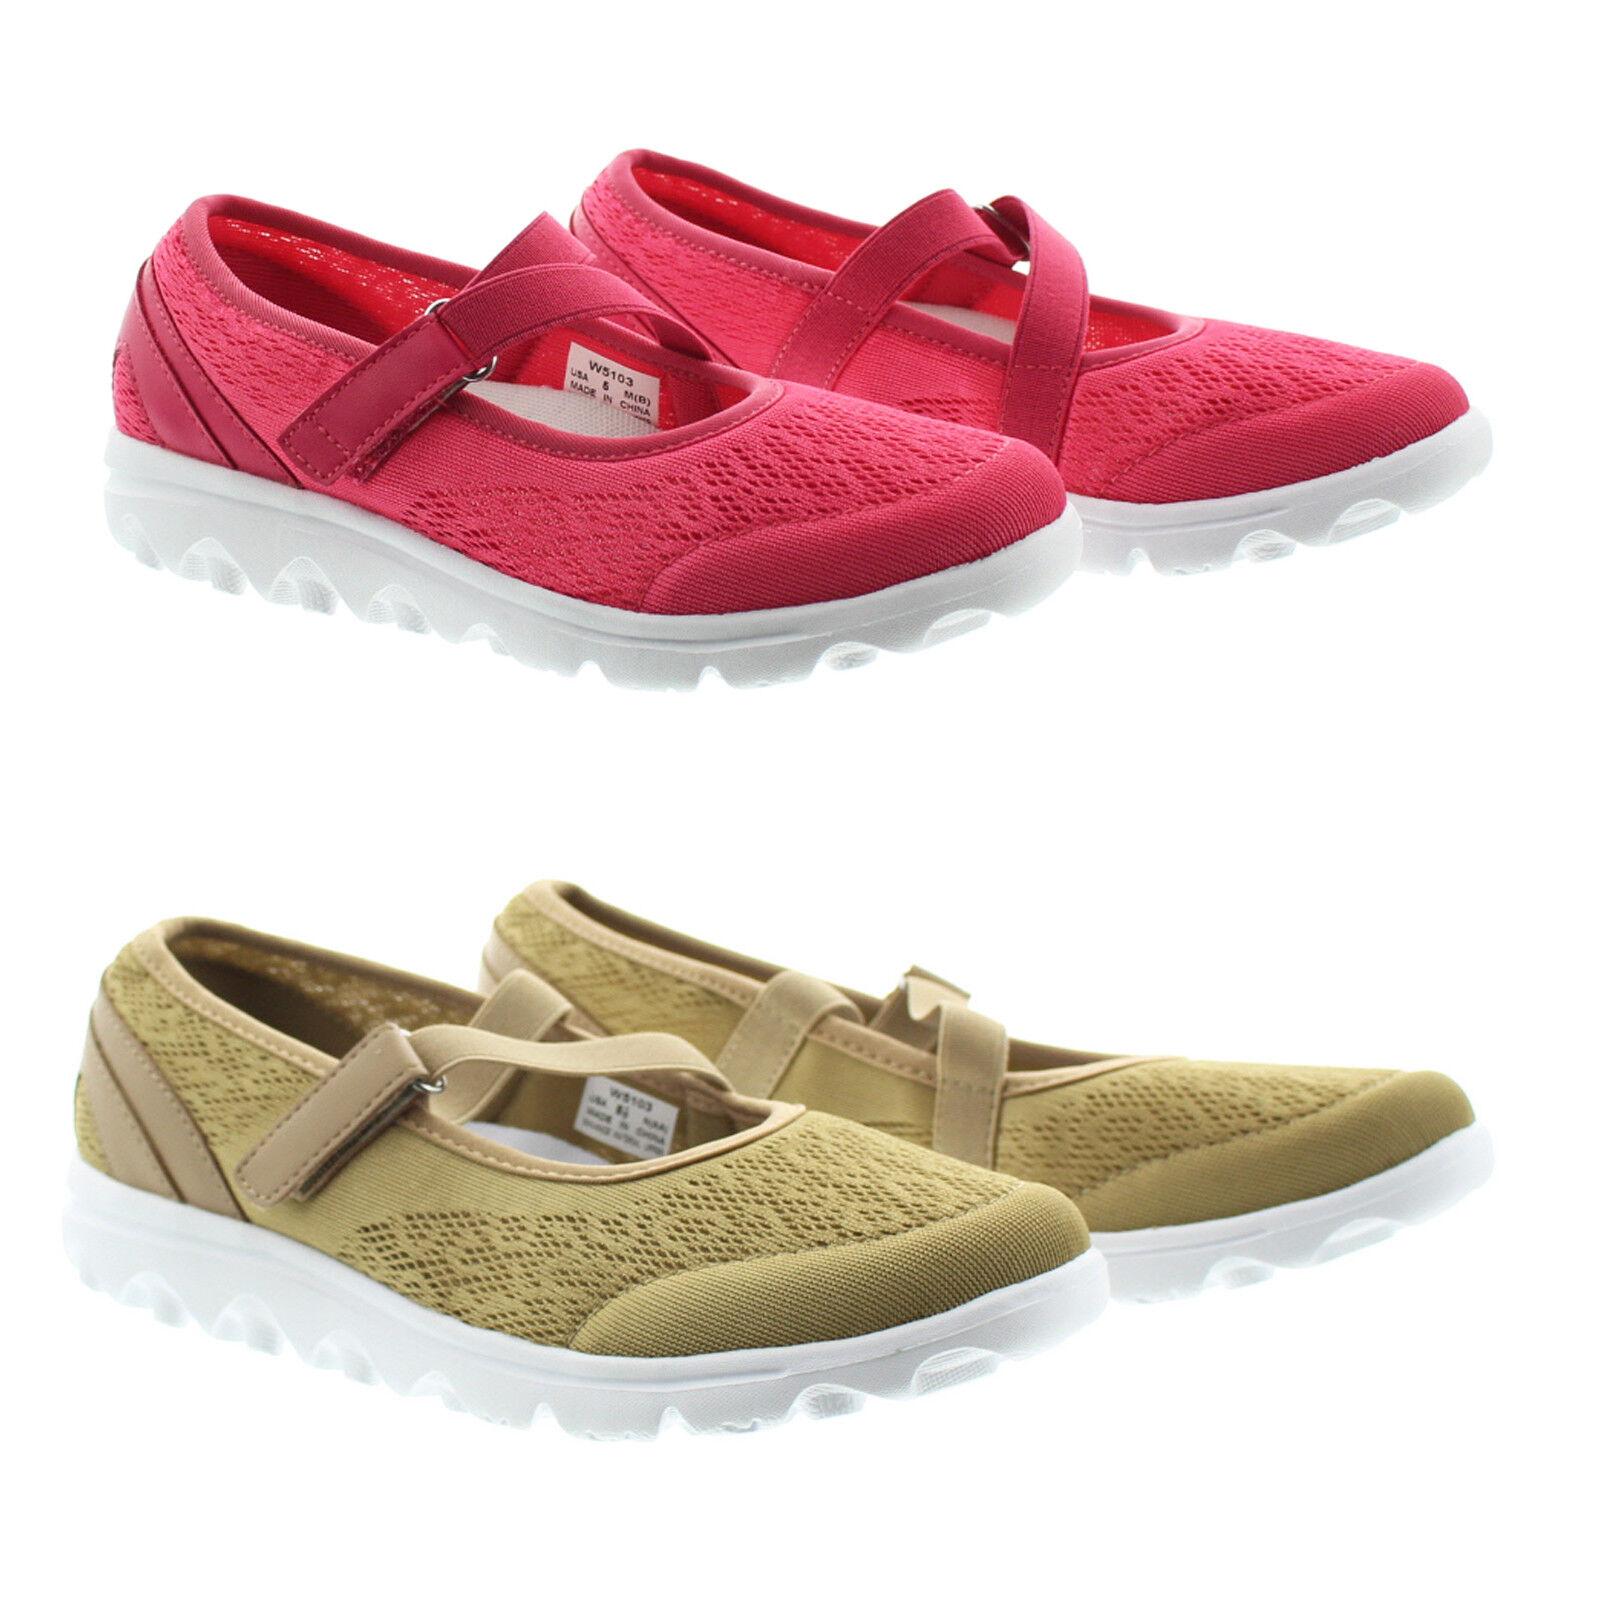 Propet W5103 Womens TravelActiv Mary Jane Fashion Sneaker Walker shoes